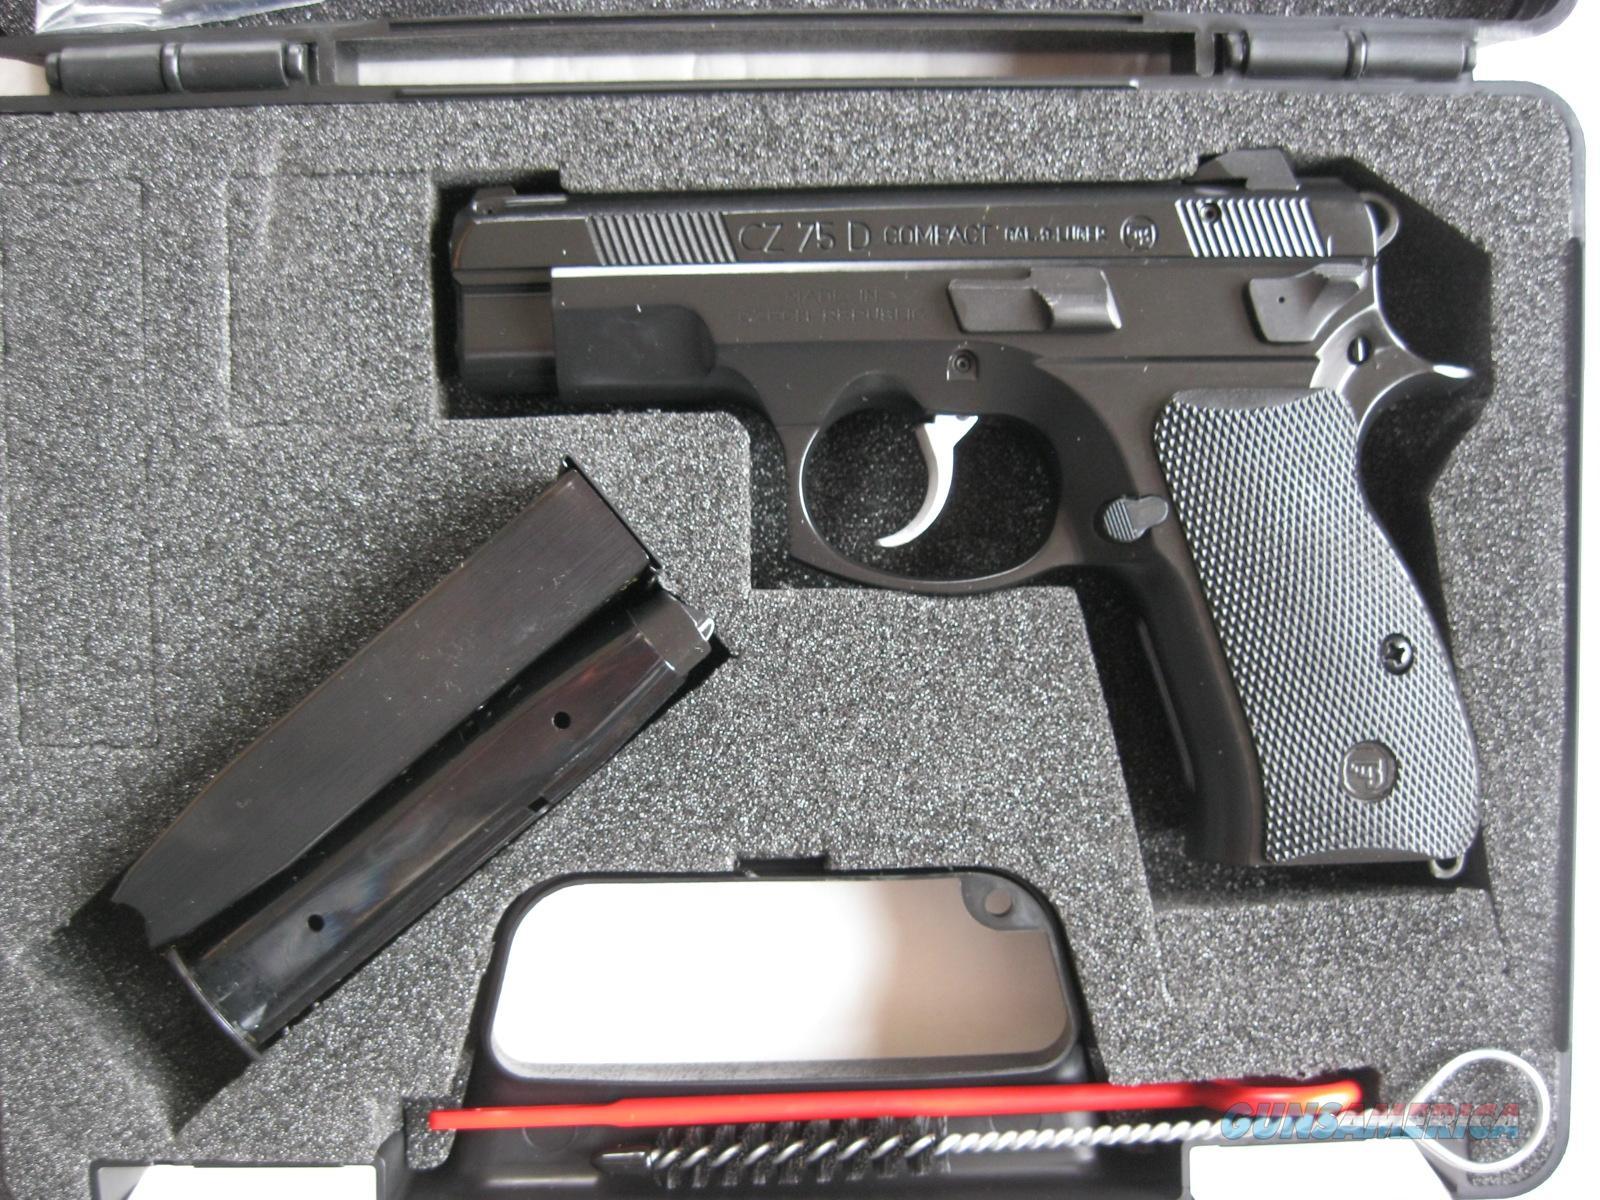 CZ-USA 75 PCR 9mm Compact Police 14 Rd Decocker 91194 *NEW*  Guns > Pistols > CZ Pistols